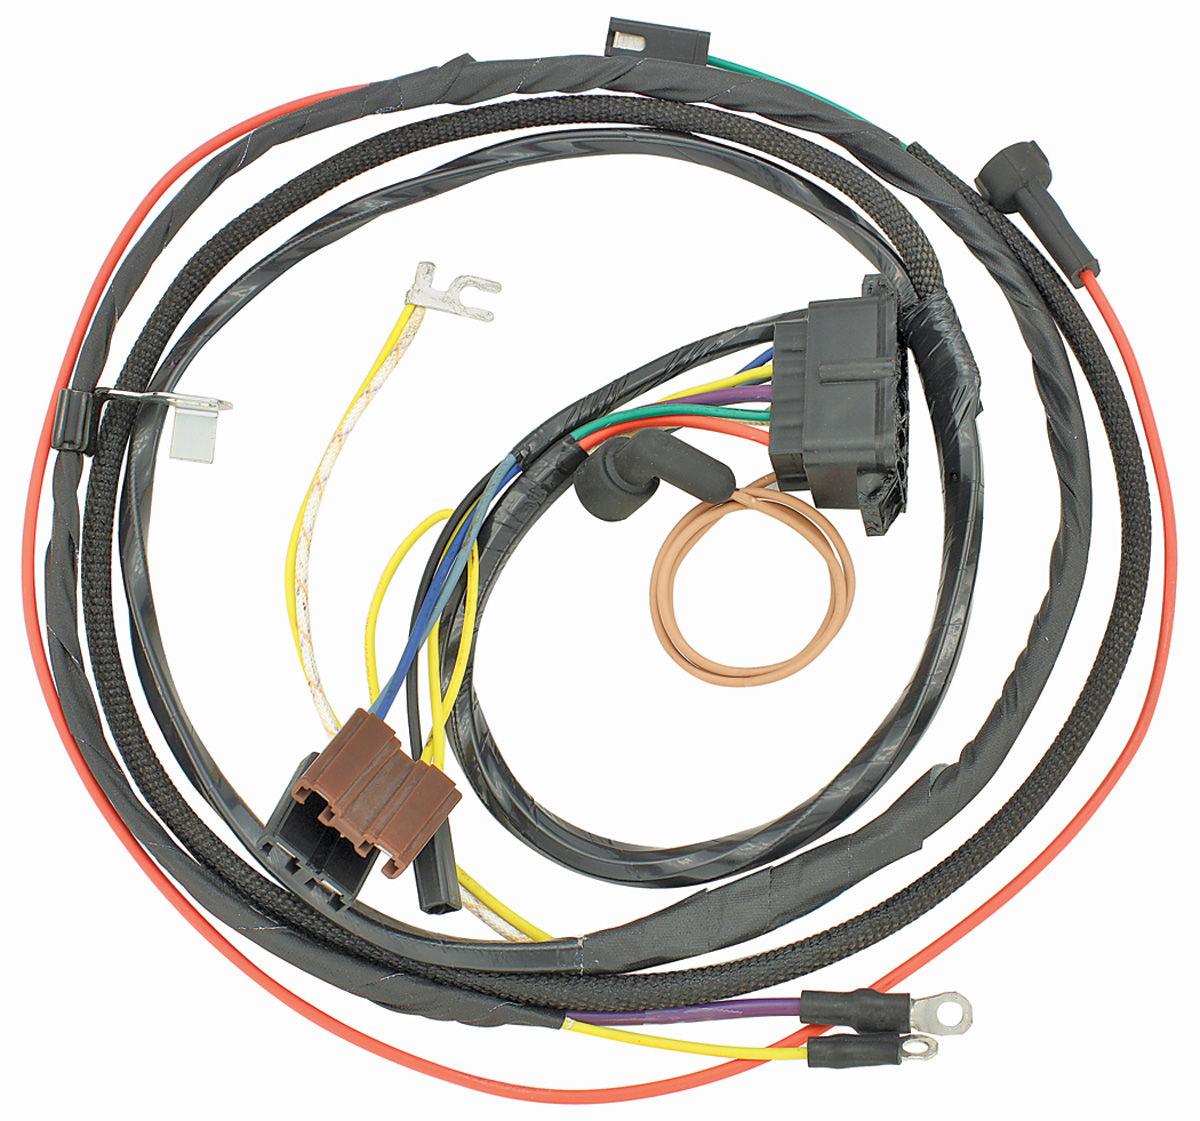 1967 chevelle wiring harness wiring diagram online 1969 chevelle wiring harness 1967 chevelle wiring harness [ 1200 x 1121 Pixel ]